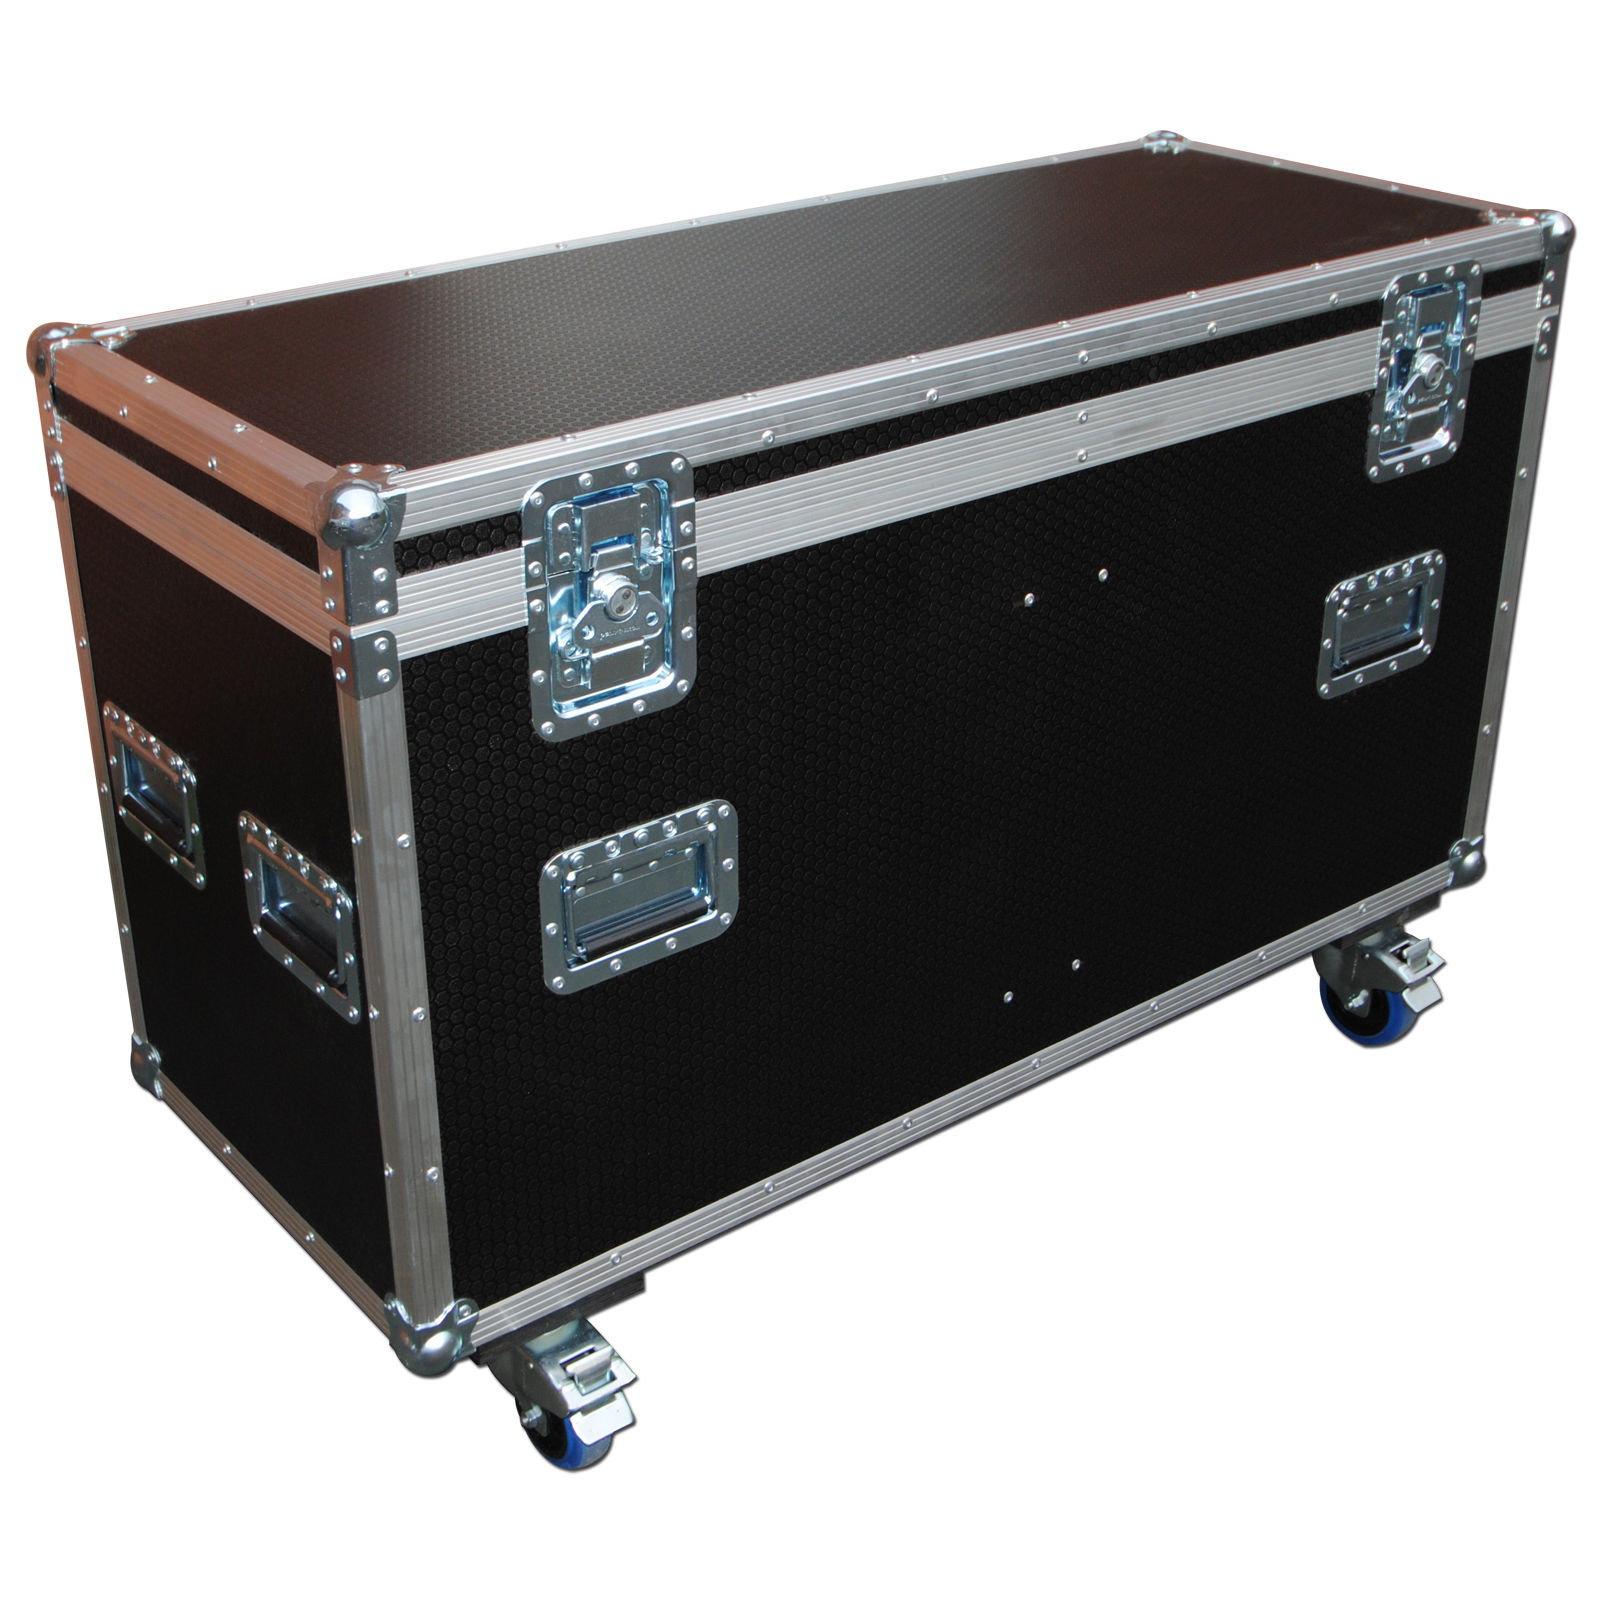 chauvet intimidator spot led 450 twin moving head flight case. Black Bedroom Furniture Sets. Home Design Ideas